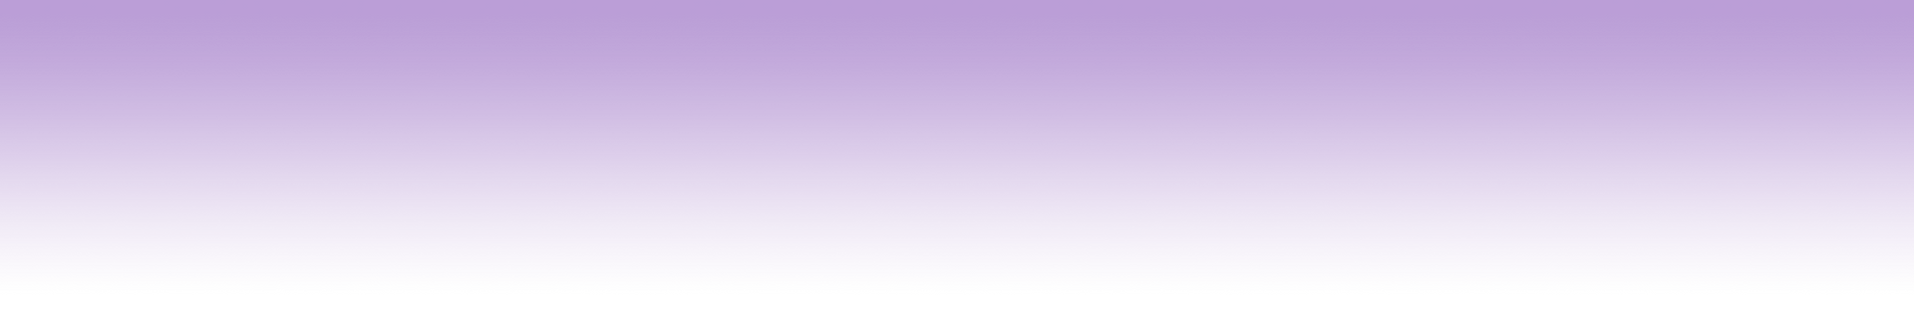 gradient_007_40.png